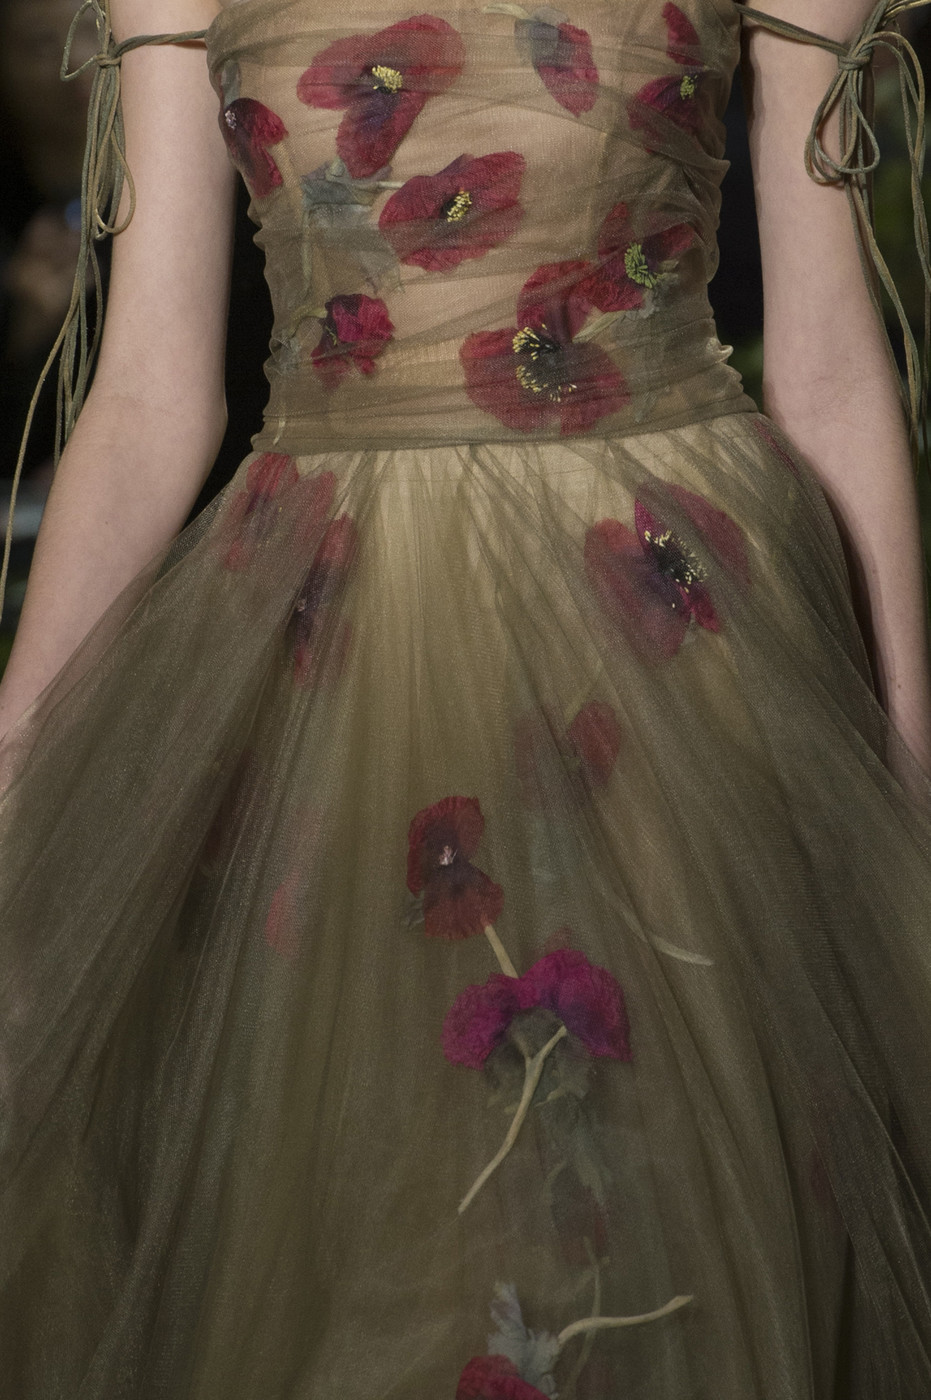 Christian+Dior+Spring+2017+Details+btBhTUDkZR9x.jpg